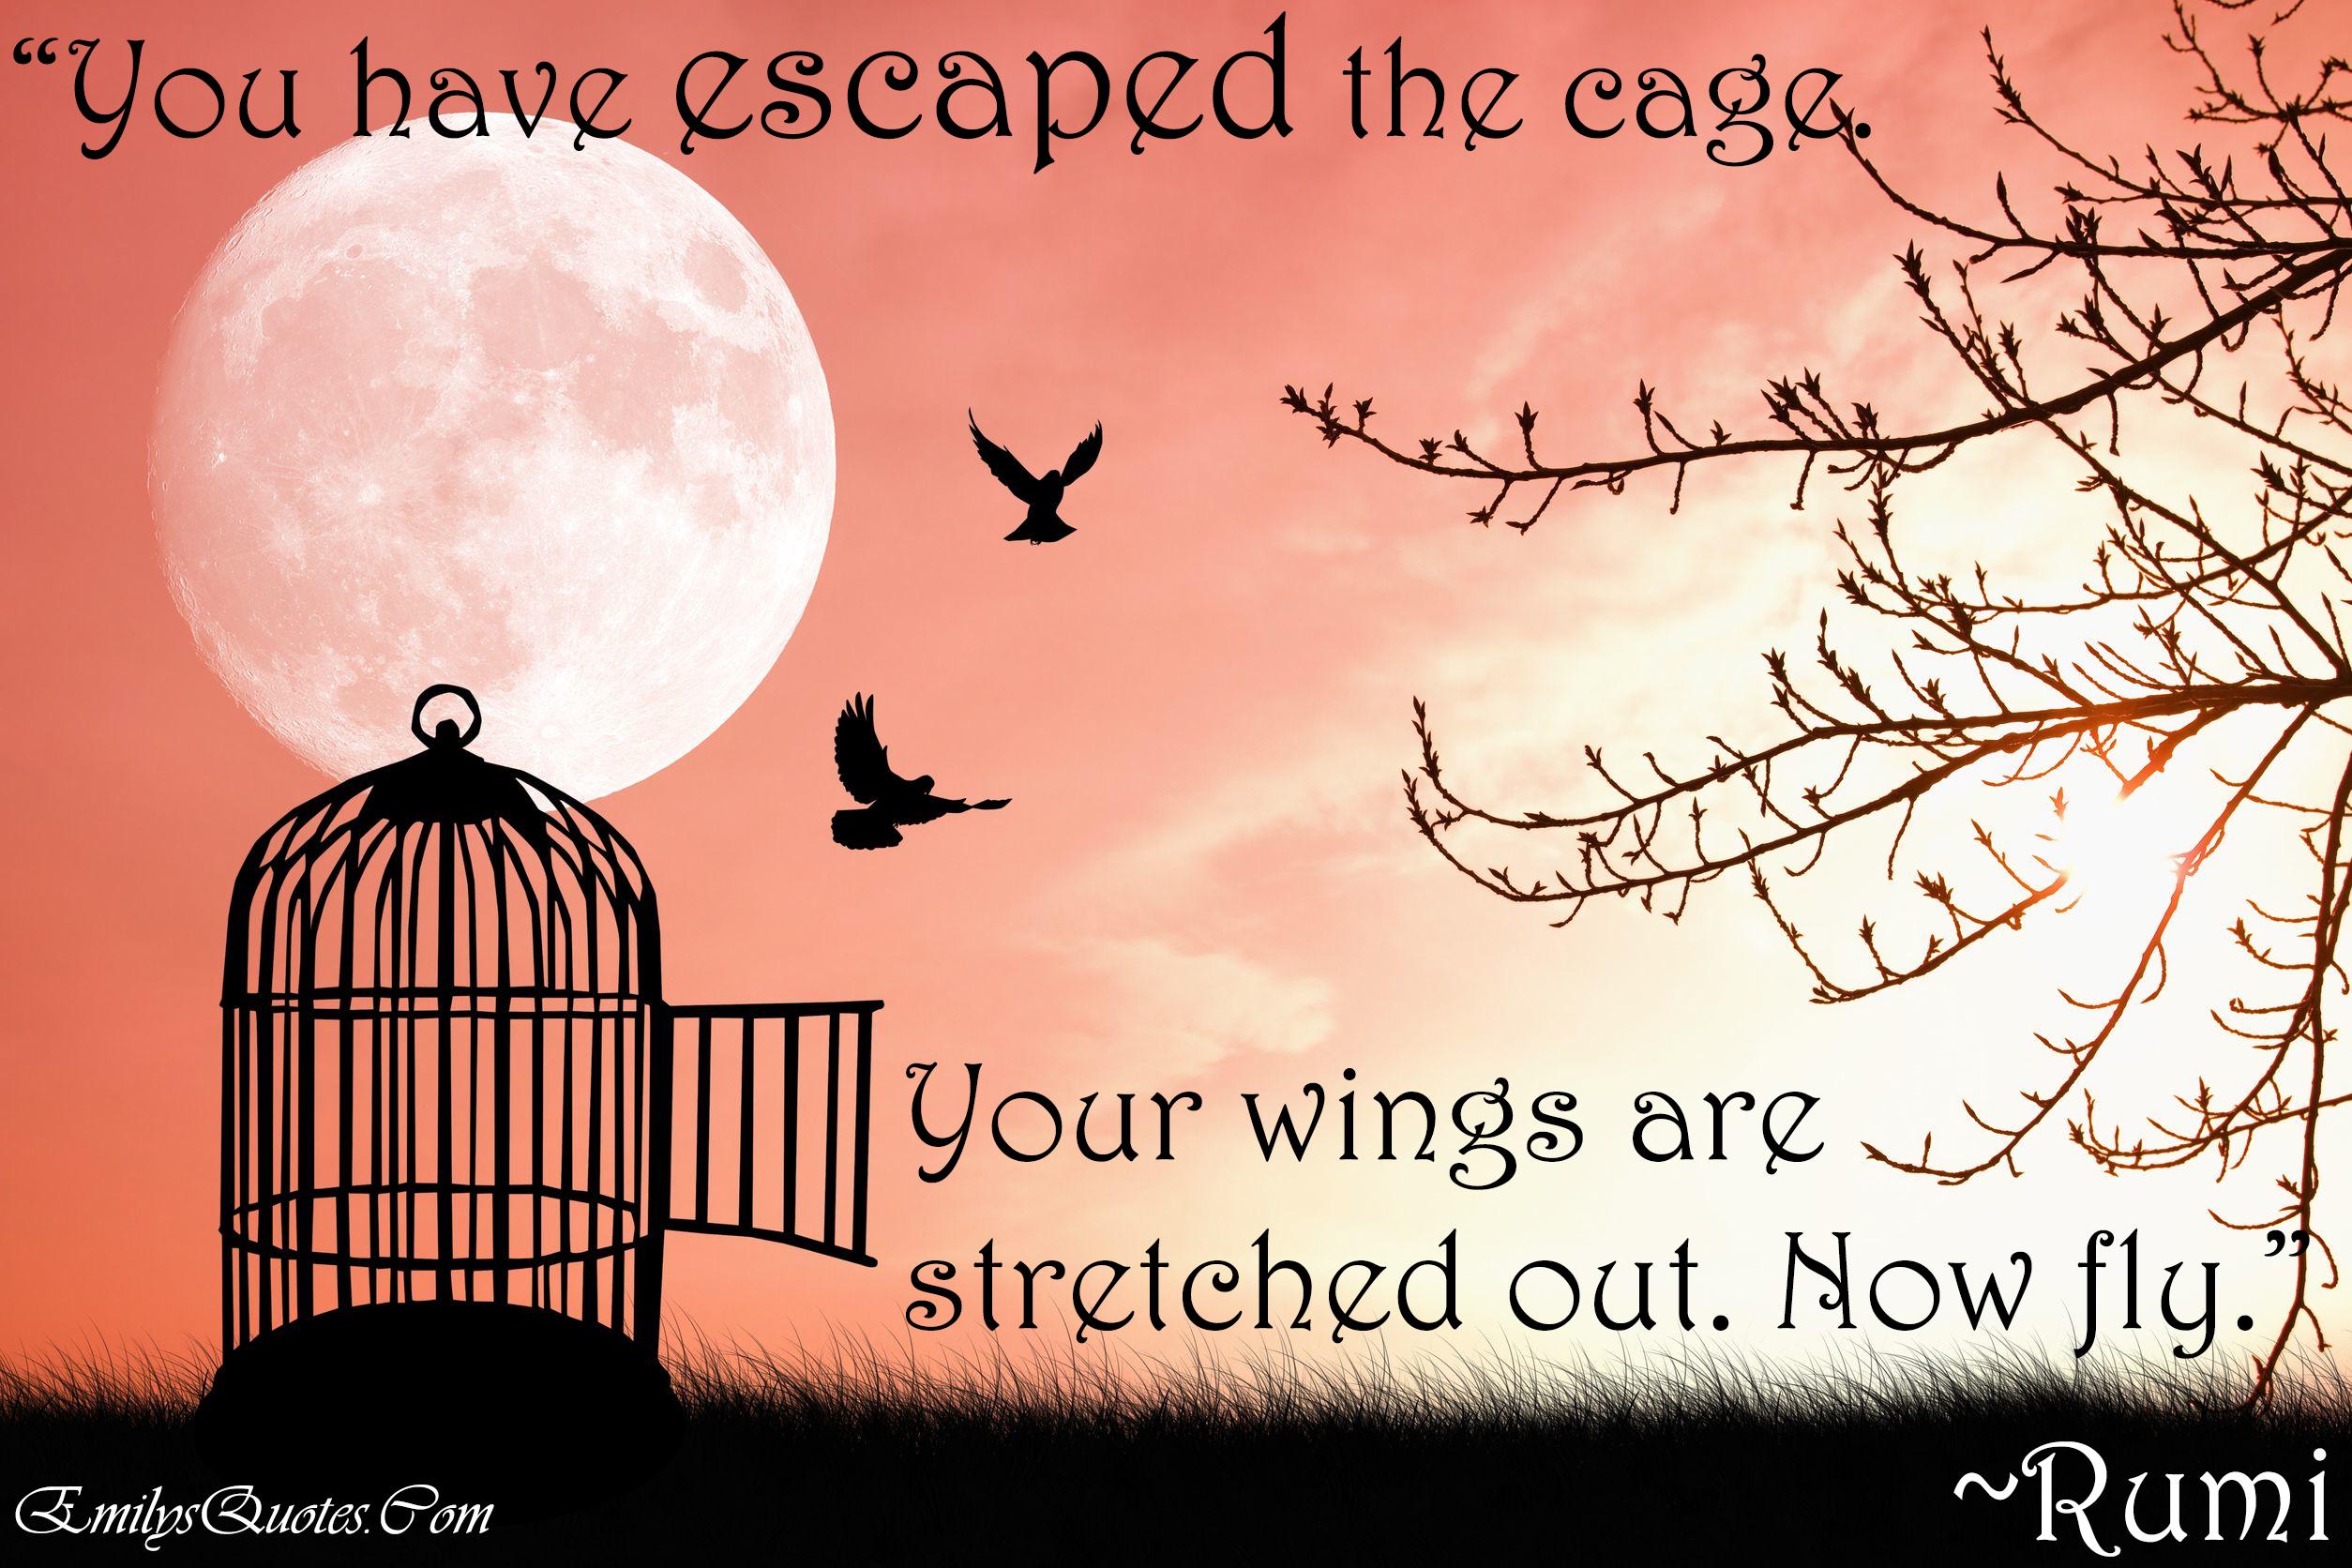 EmilysQuotes.Com - freedom, amazing, great, Rumi, Encouraging, Inspirational